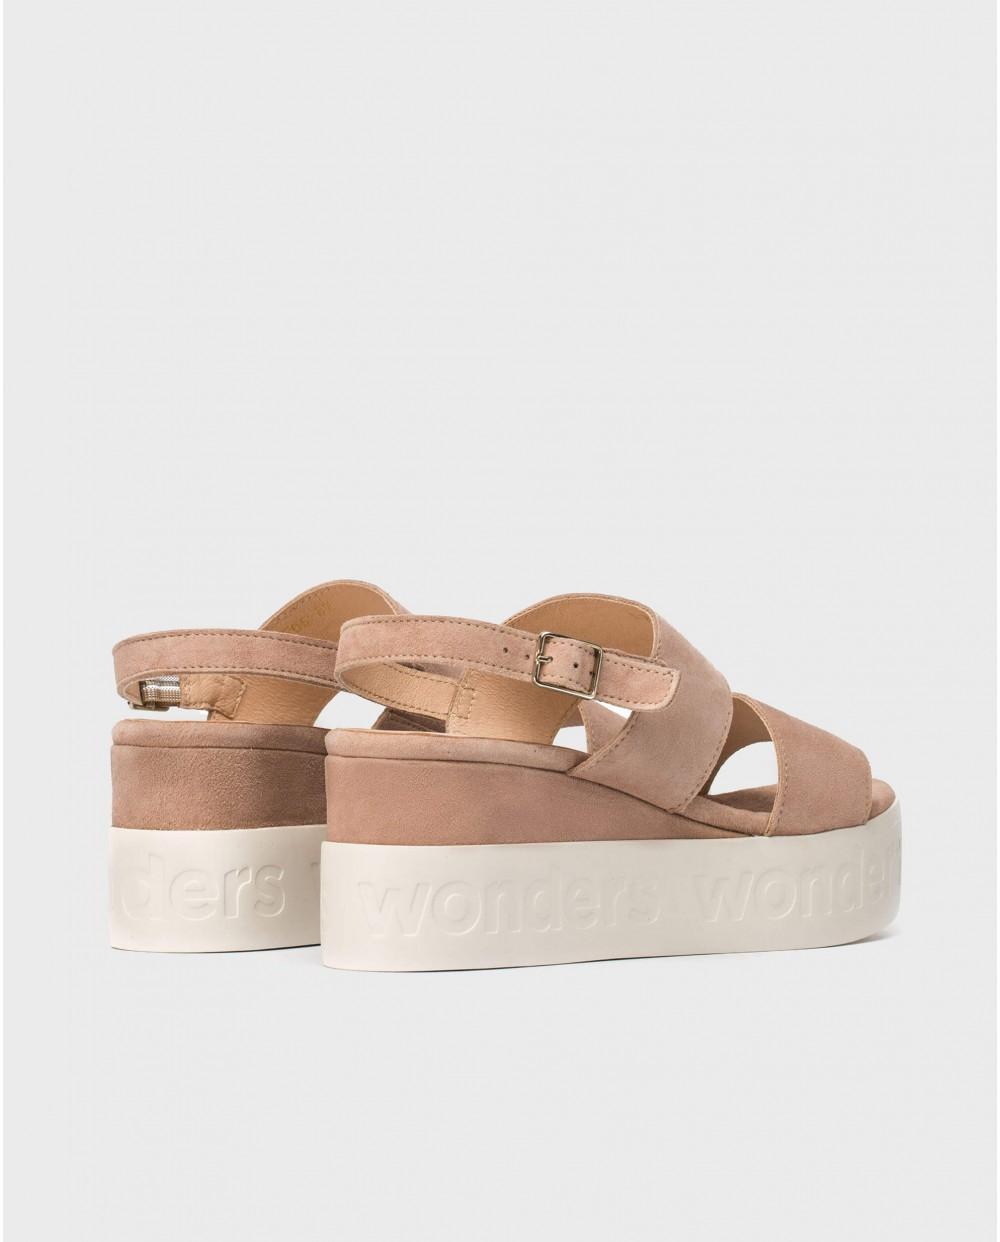 Wonders-Sandals-Platform sandal with double strap.